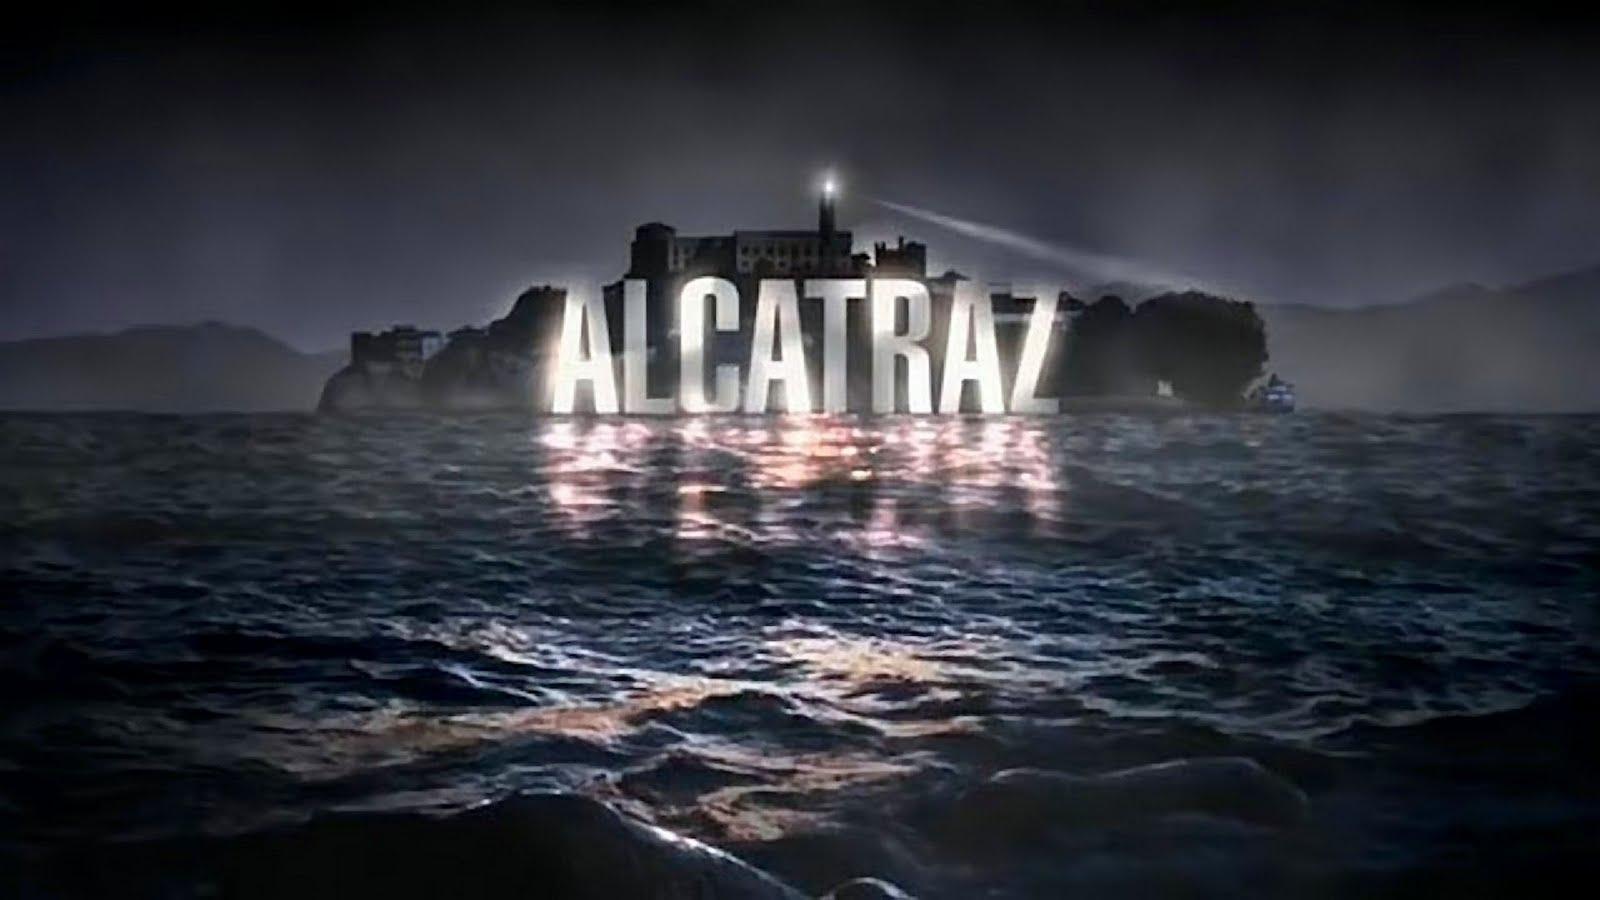 http://2.bp.blogspot.com/-jIXxzONP_aY/TdoNEKgBrNI/AAAAAAAAEUM/XCRMw6MSBE4/s1600/alcatraz-wallpaper2.jpg